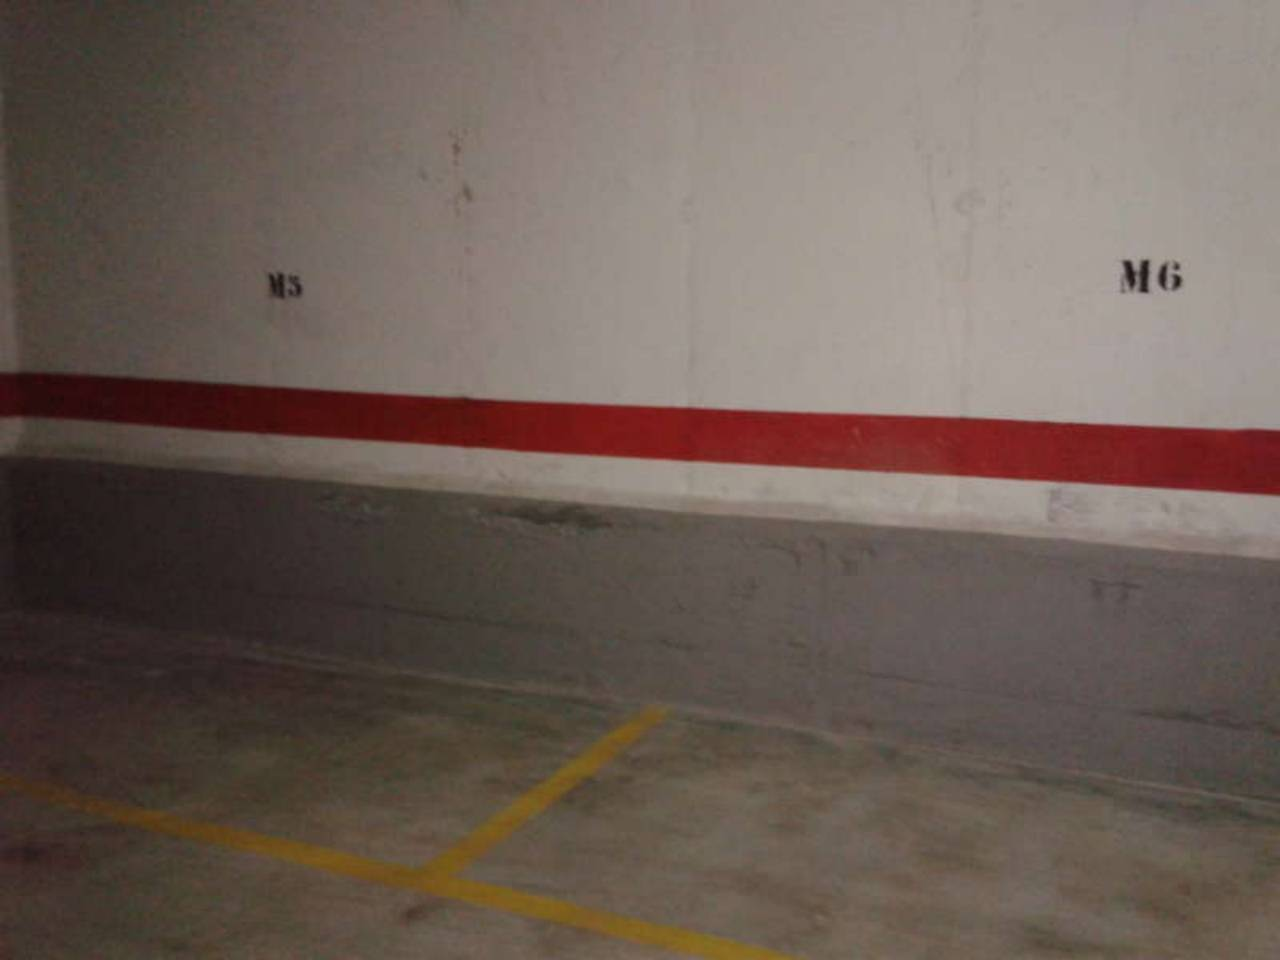 Lloguer Aparcament cotxe  Florida. Superf. 26 m², 1 plazas, subterráneo, ascensor, acceso independi